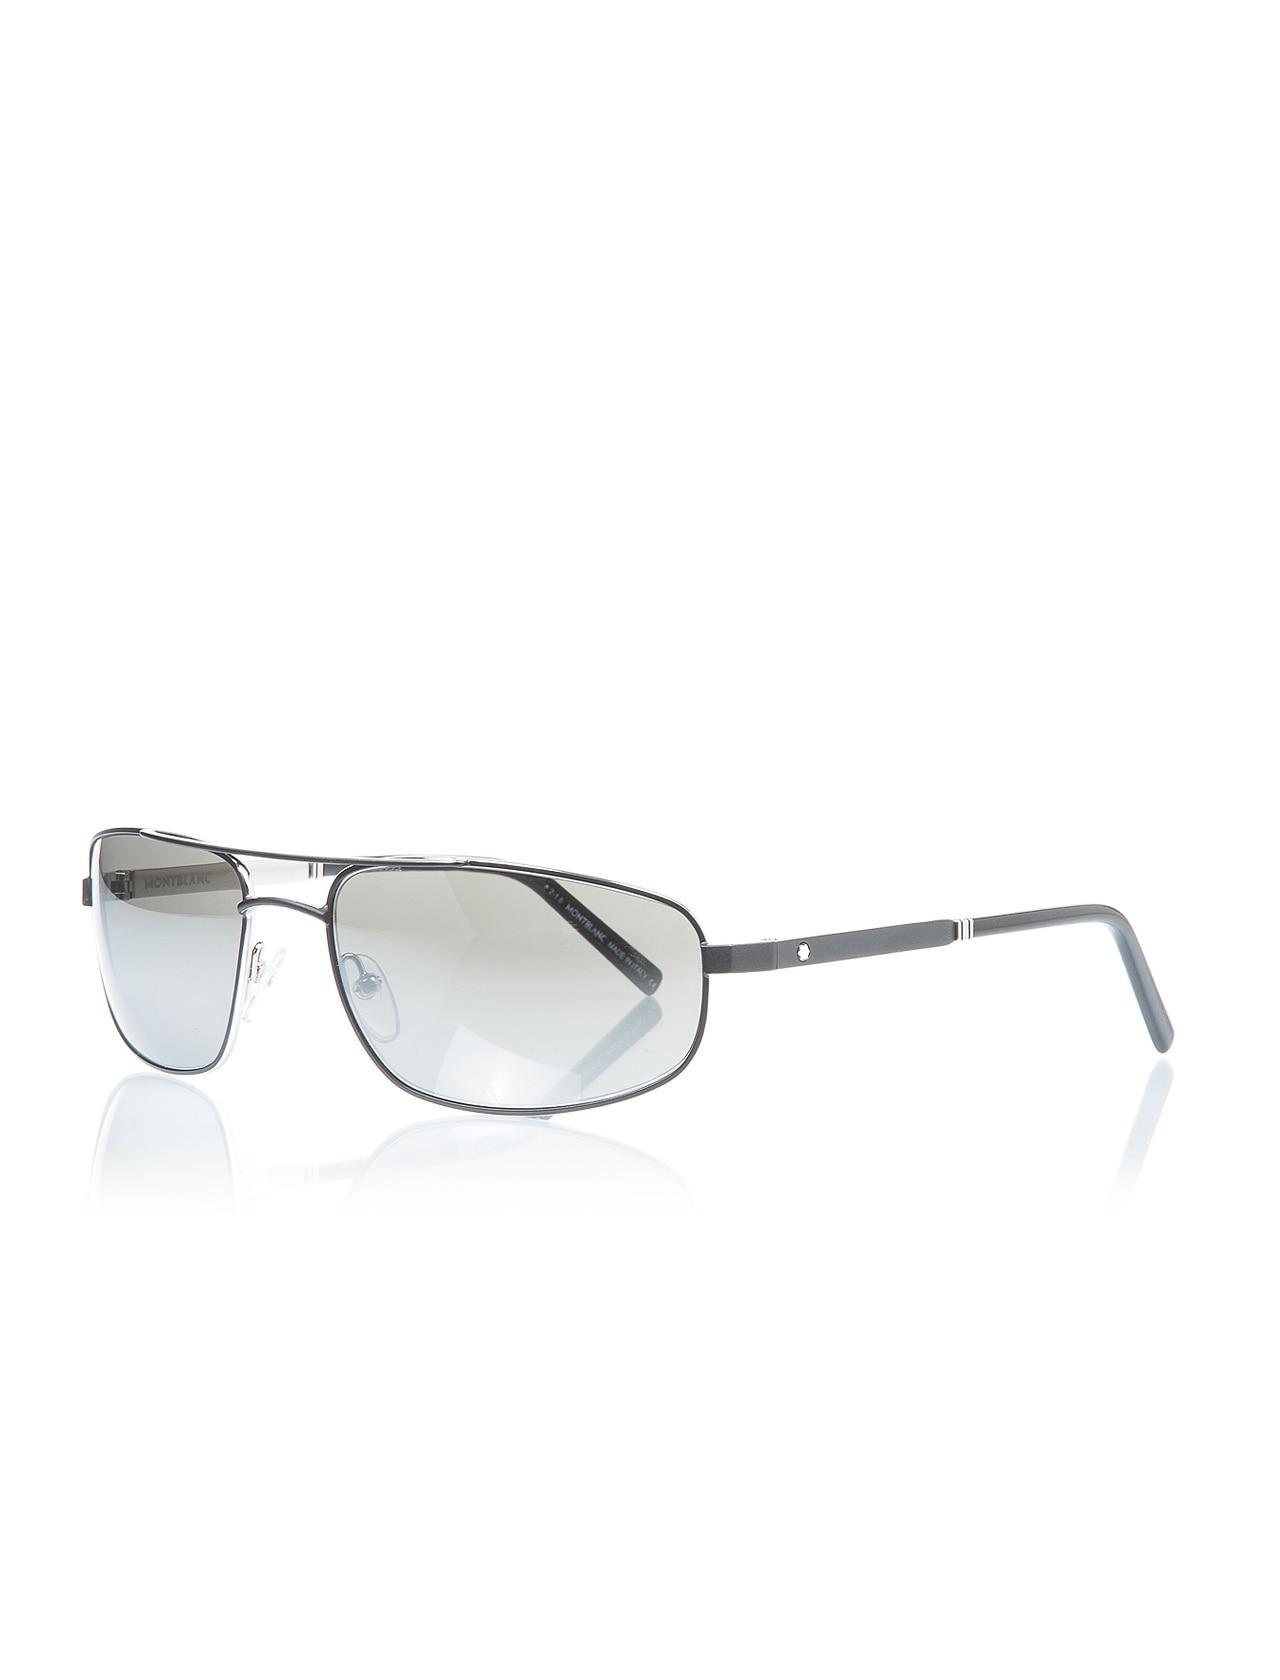 Men's sunglasses mb 650 16c metal black organic rectangle rectangular 60-17-130 mont blanc